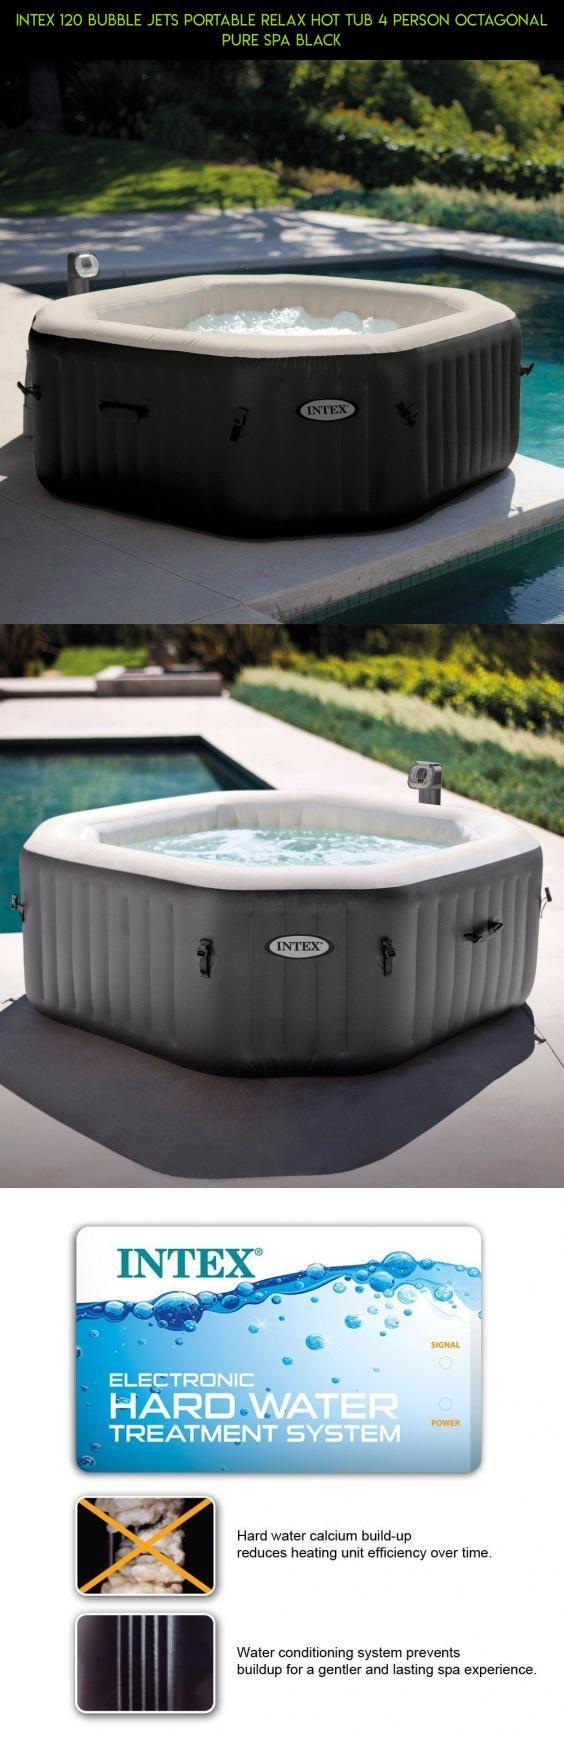 Intex 120 Bubble Jets Portable Relax Hot Tub 4 Person Octagonal Pure ...